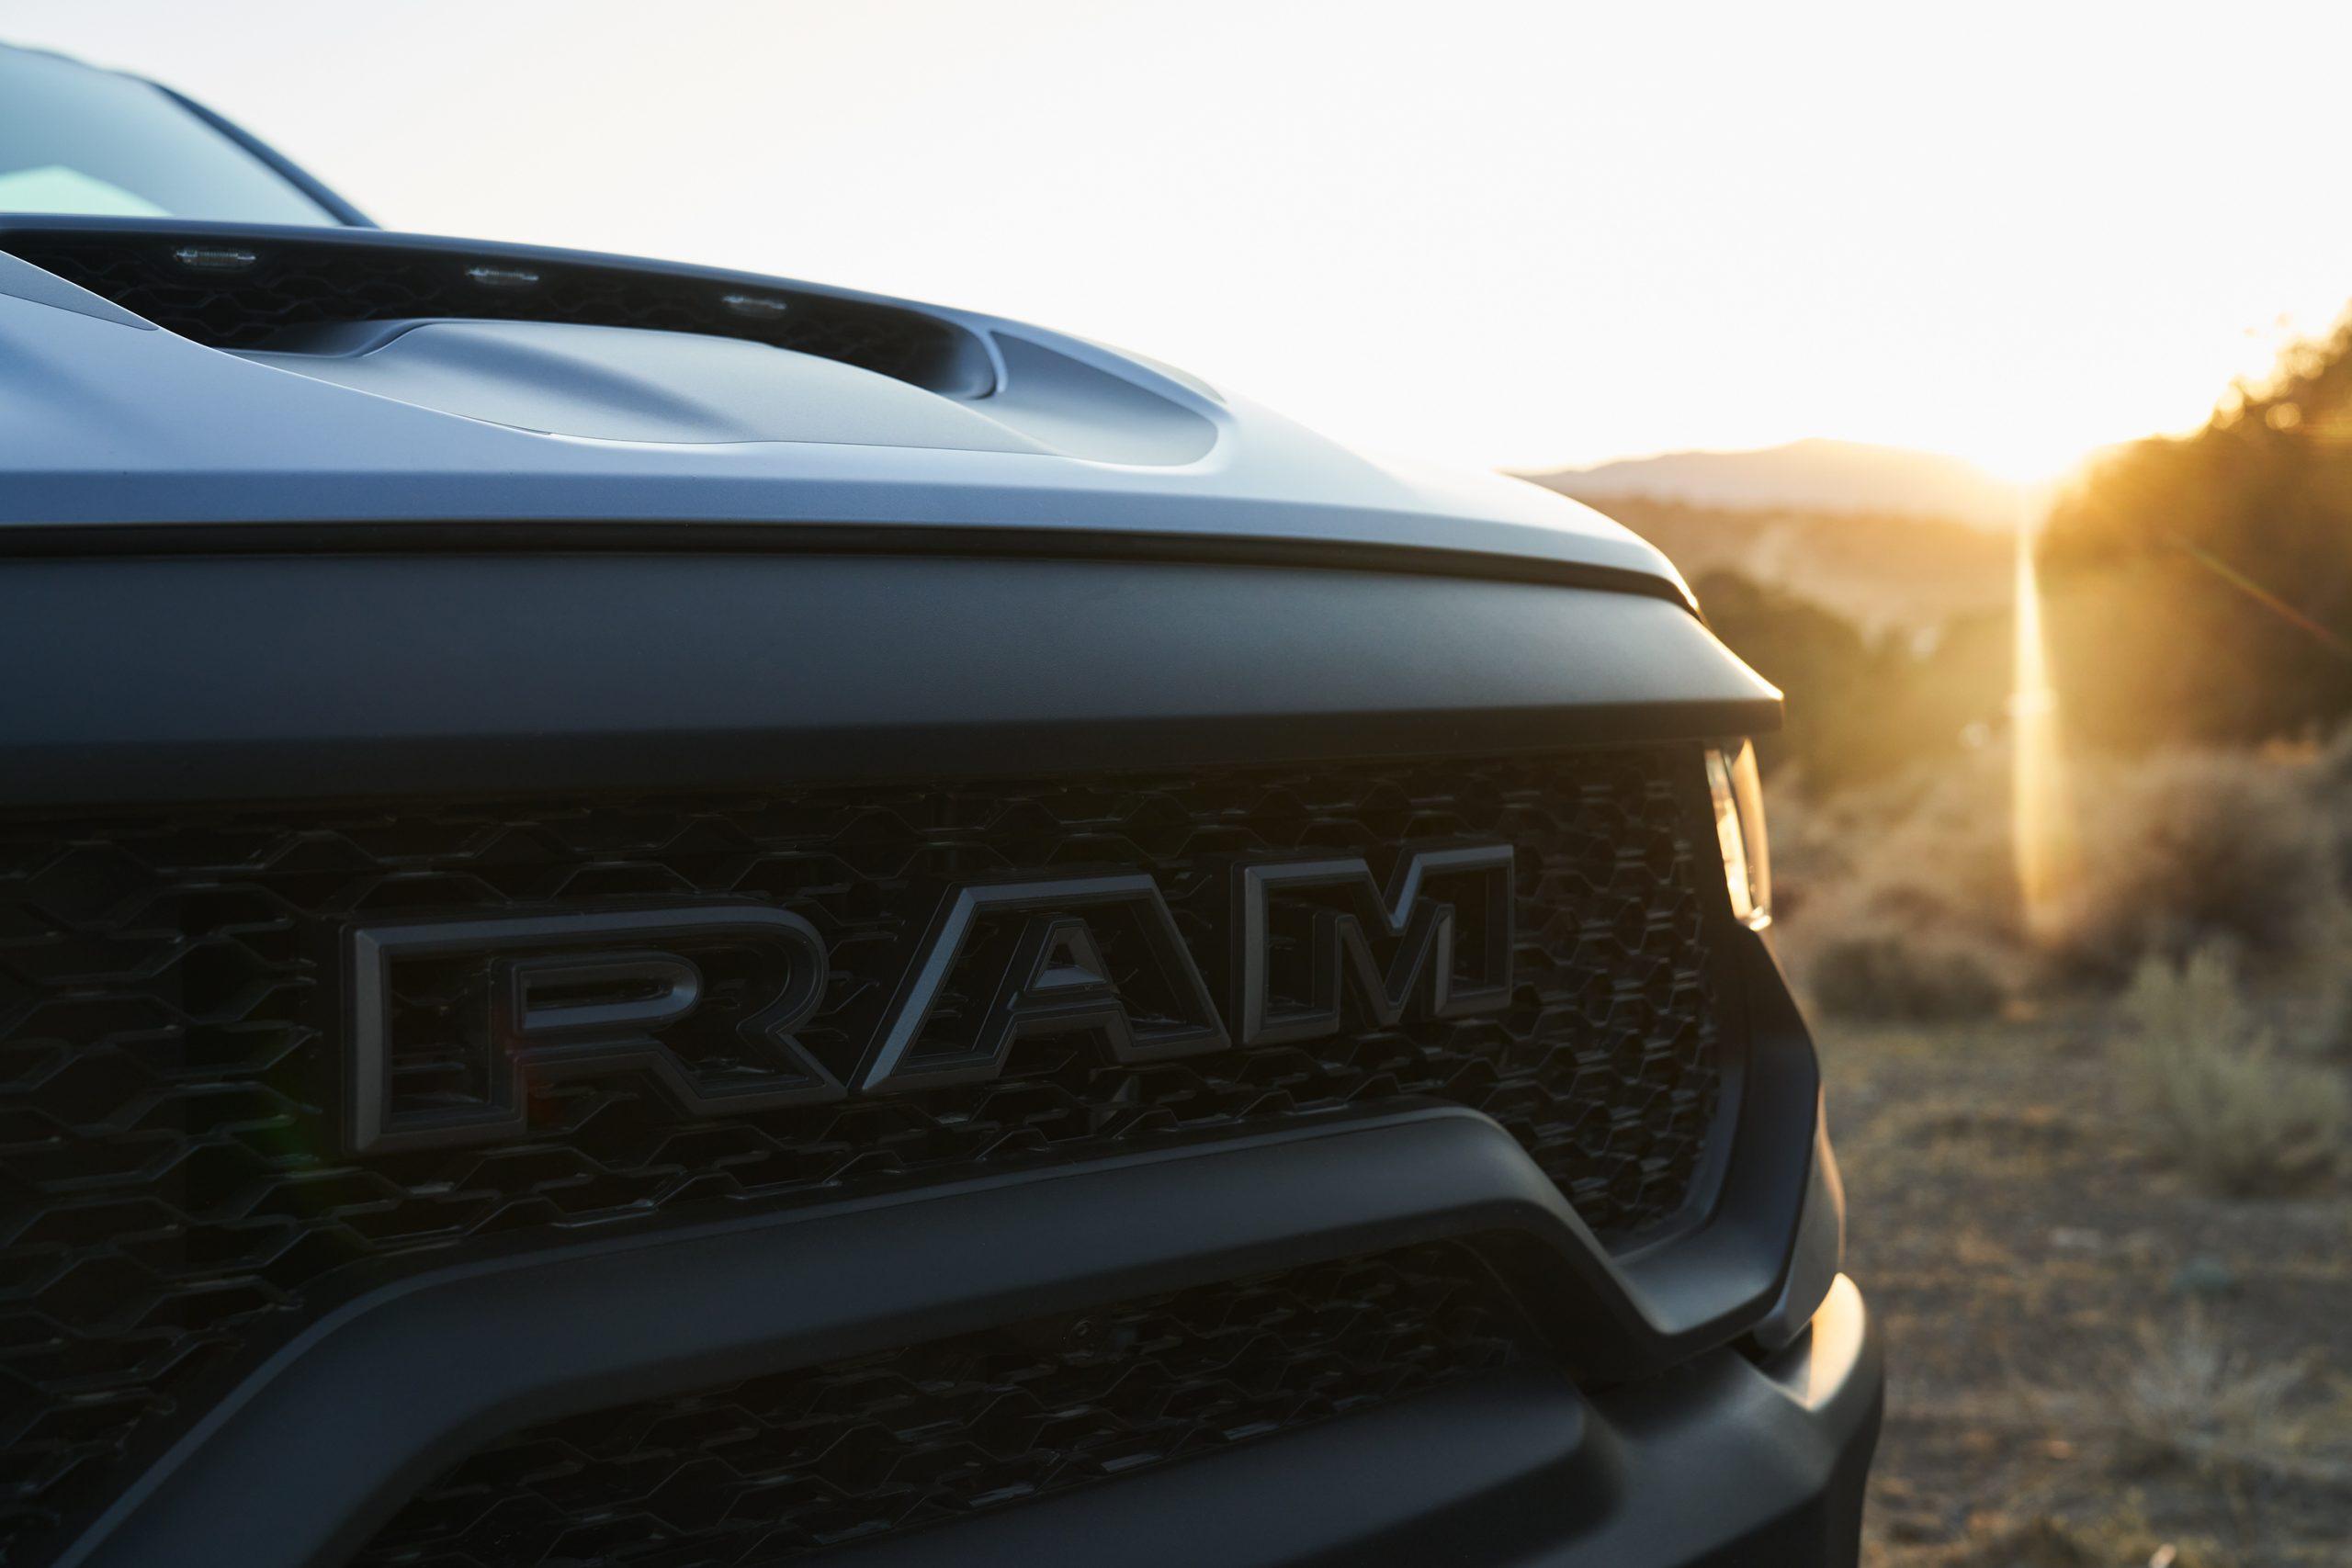 2021 Ram 1500 TRX grille detail